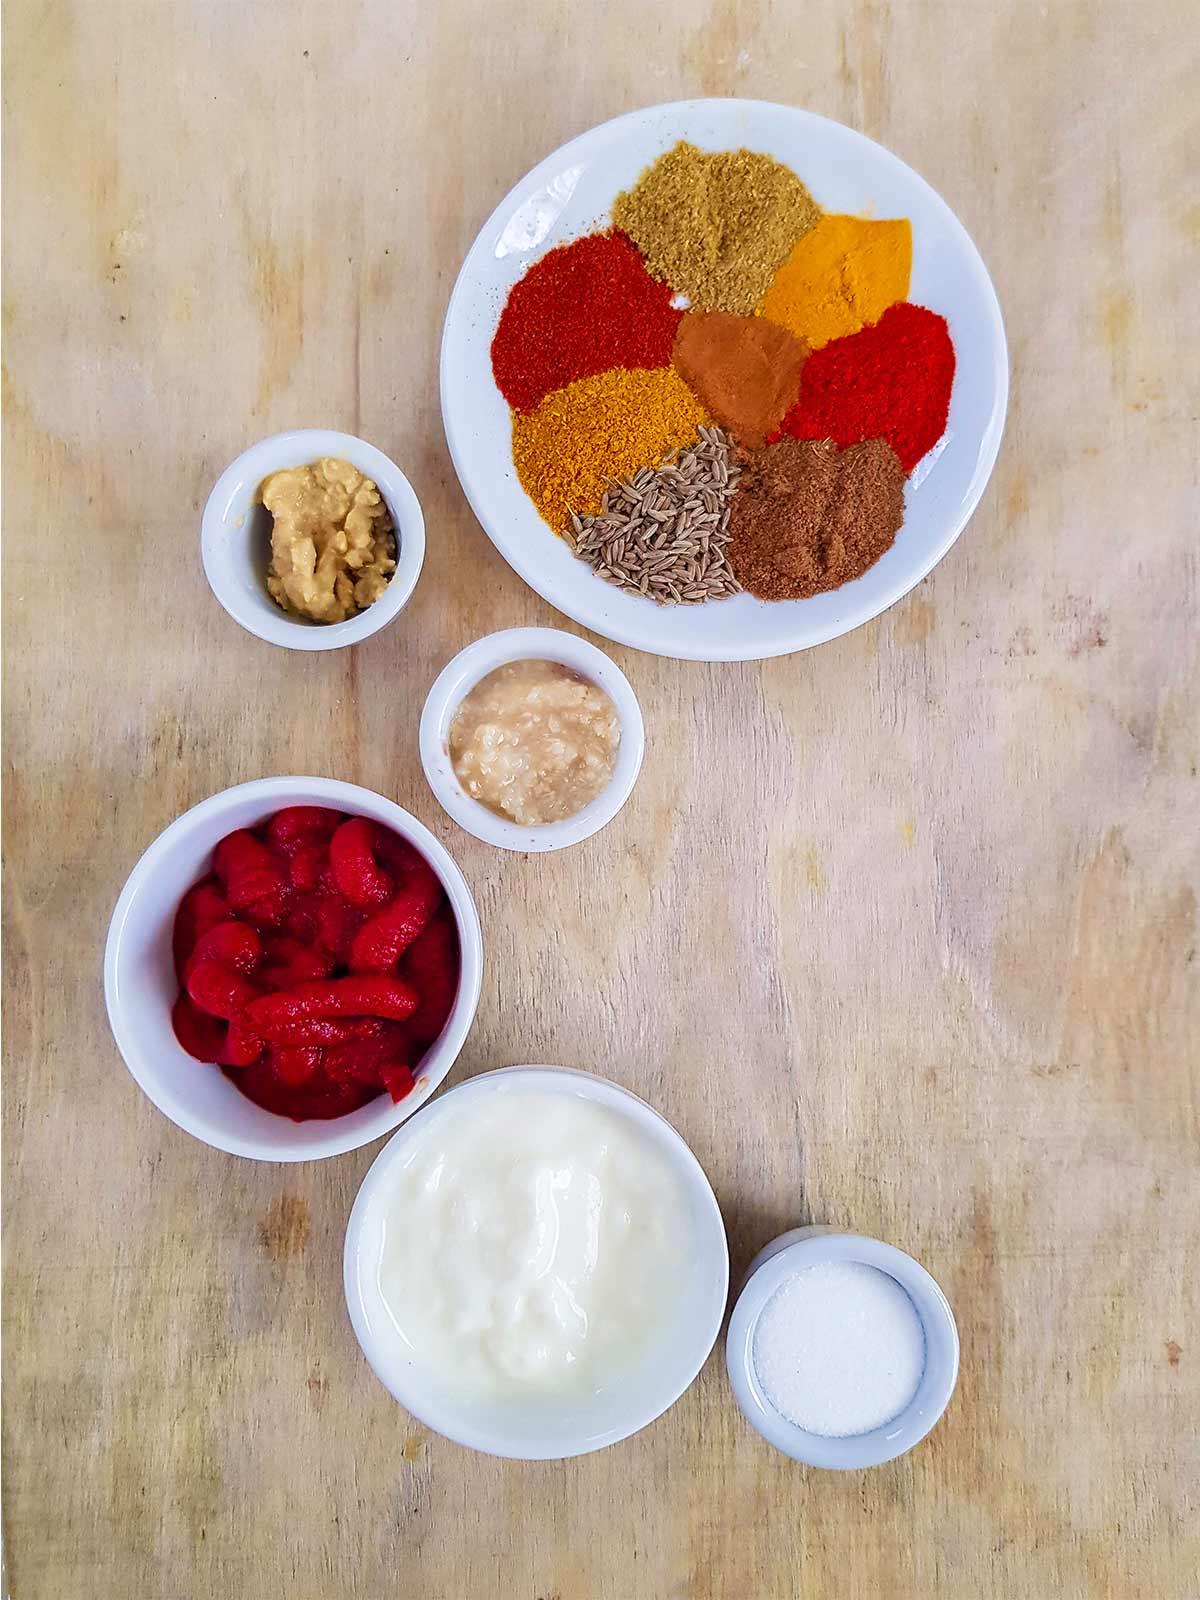 Marination batter spices for vegetables